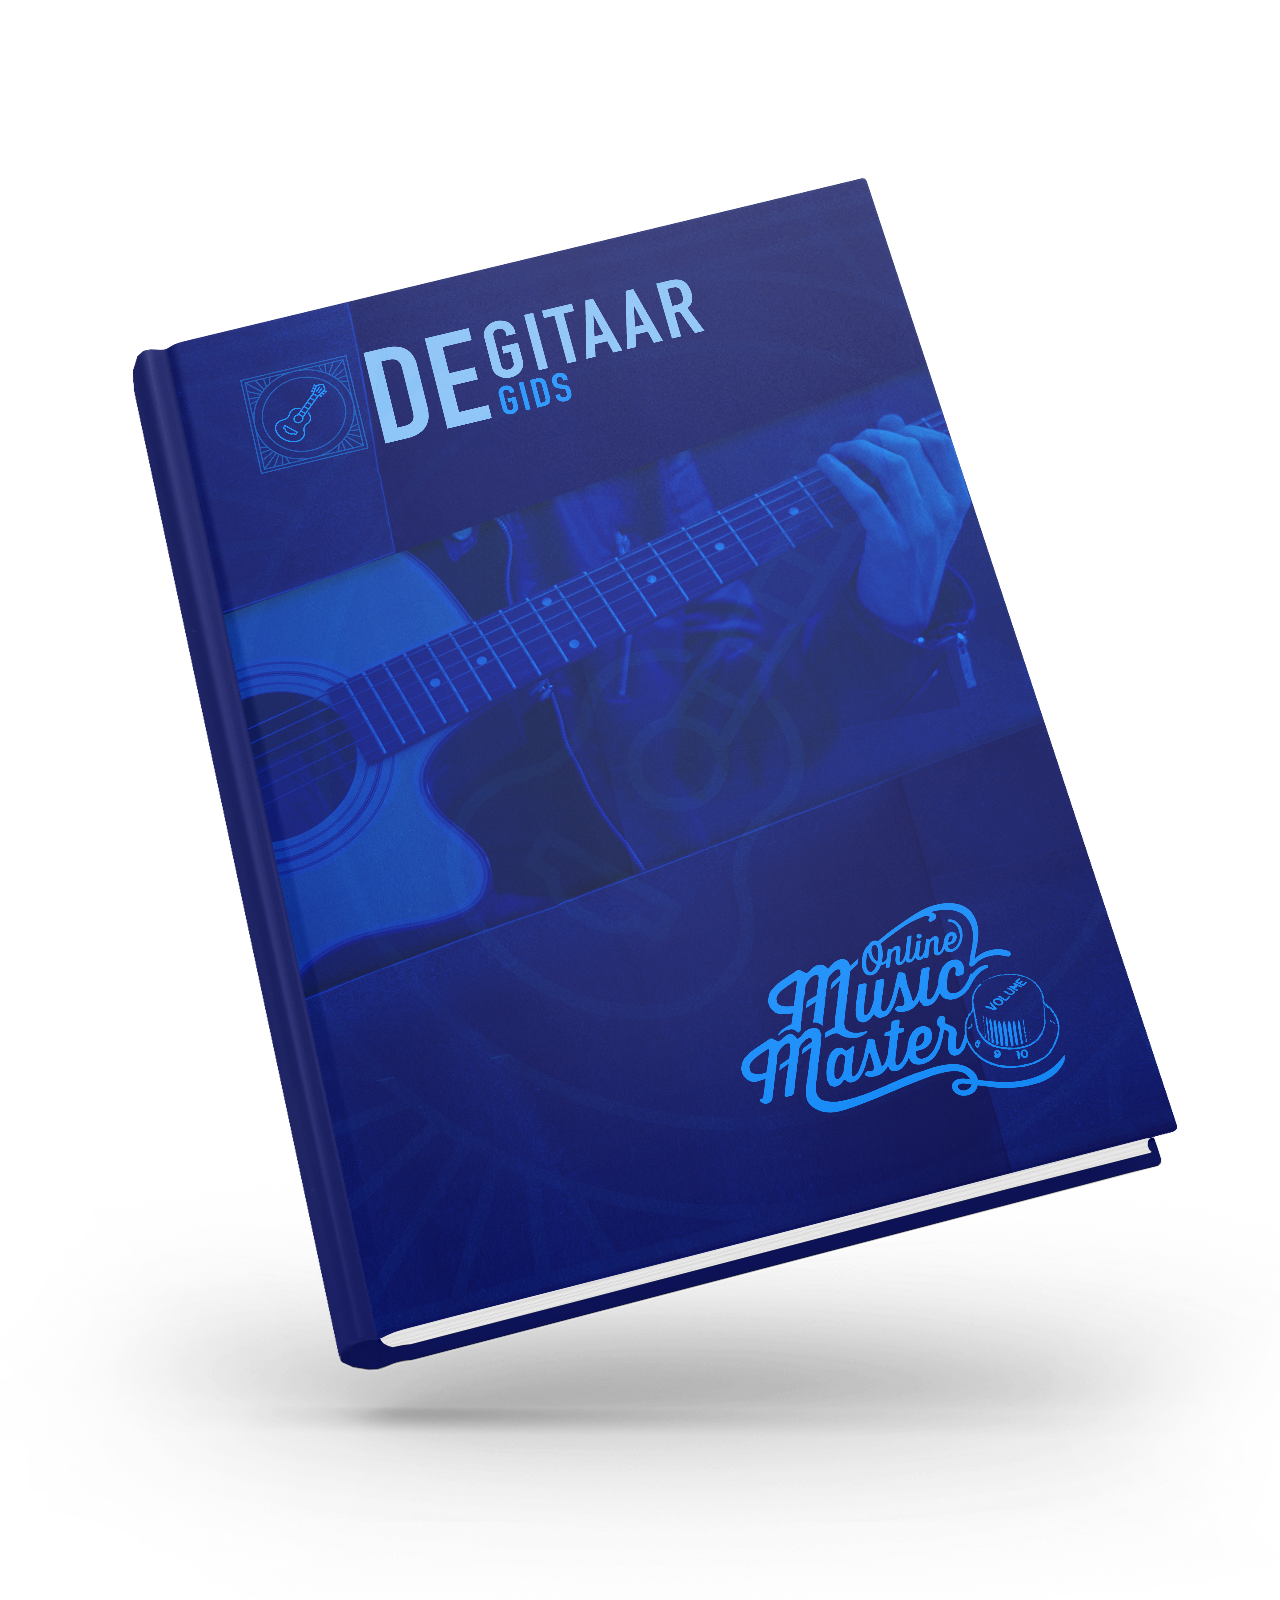 De Gitaar Gids | Online Music Master